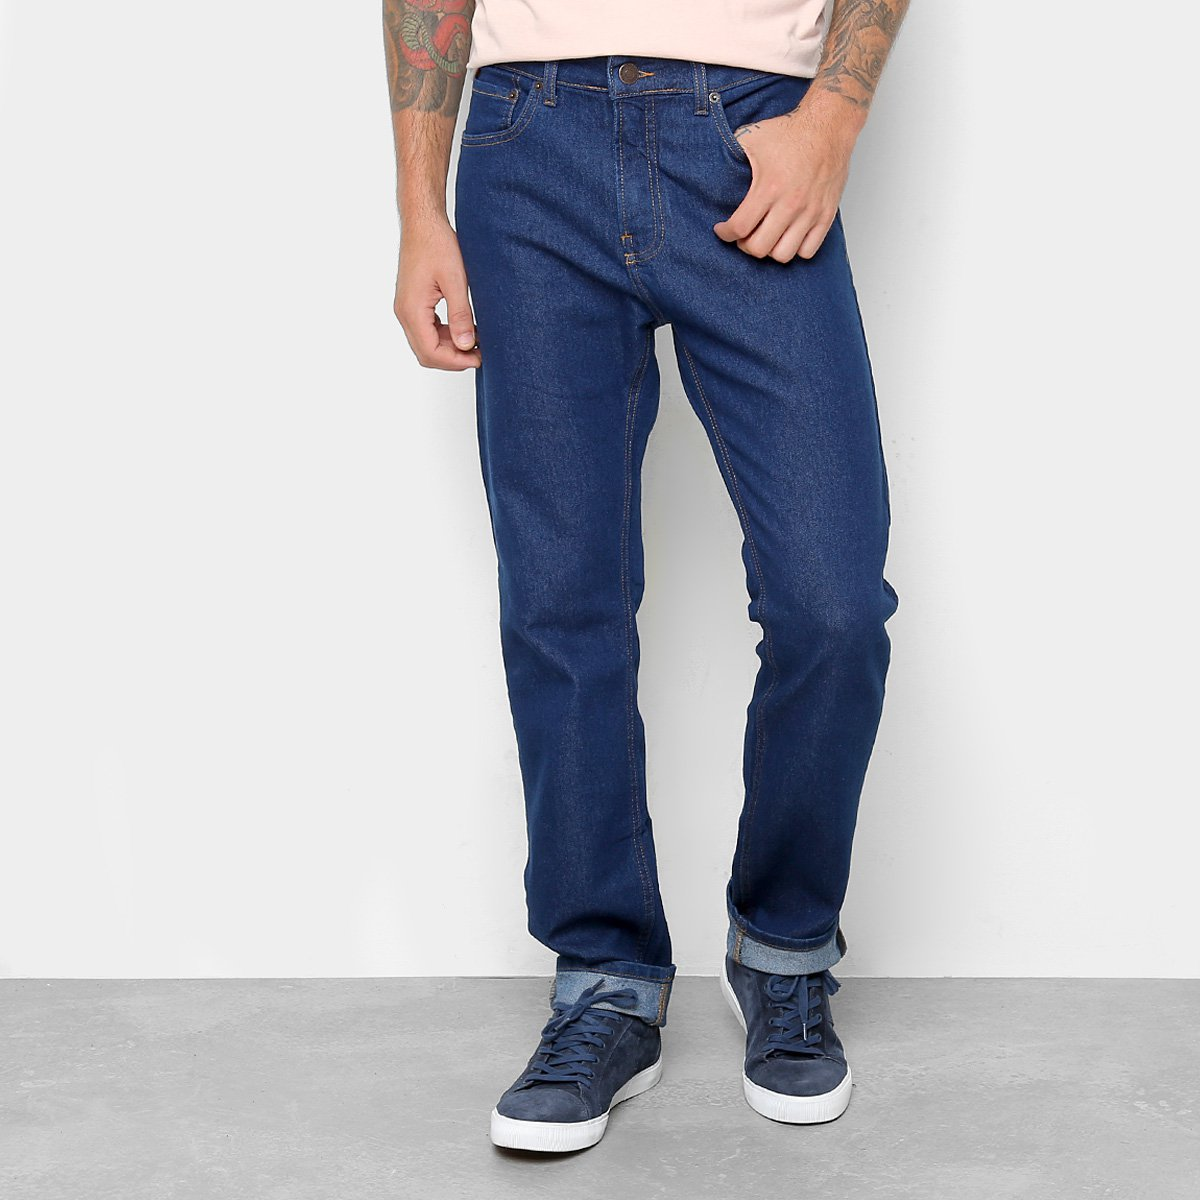 e676b7eca Calça Jeans Reta Calvin Klein Lavagem Clássica Cintura Alta Five Pock Slim Straight  Masculina